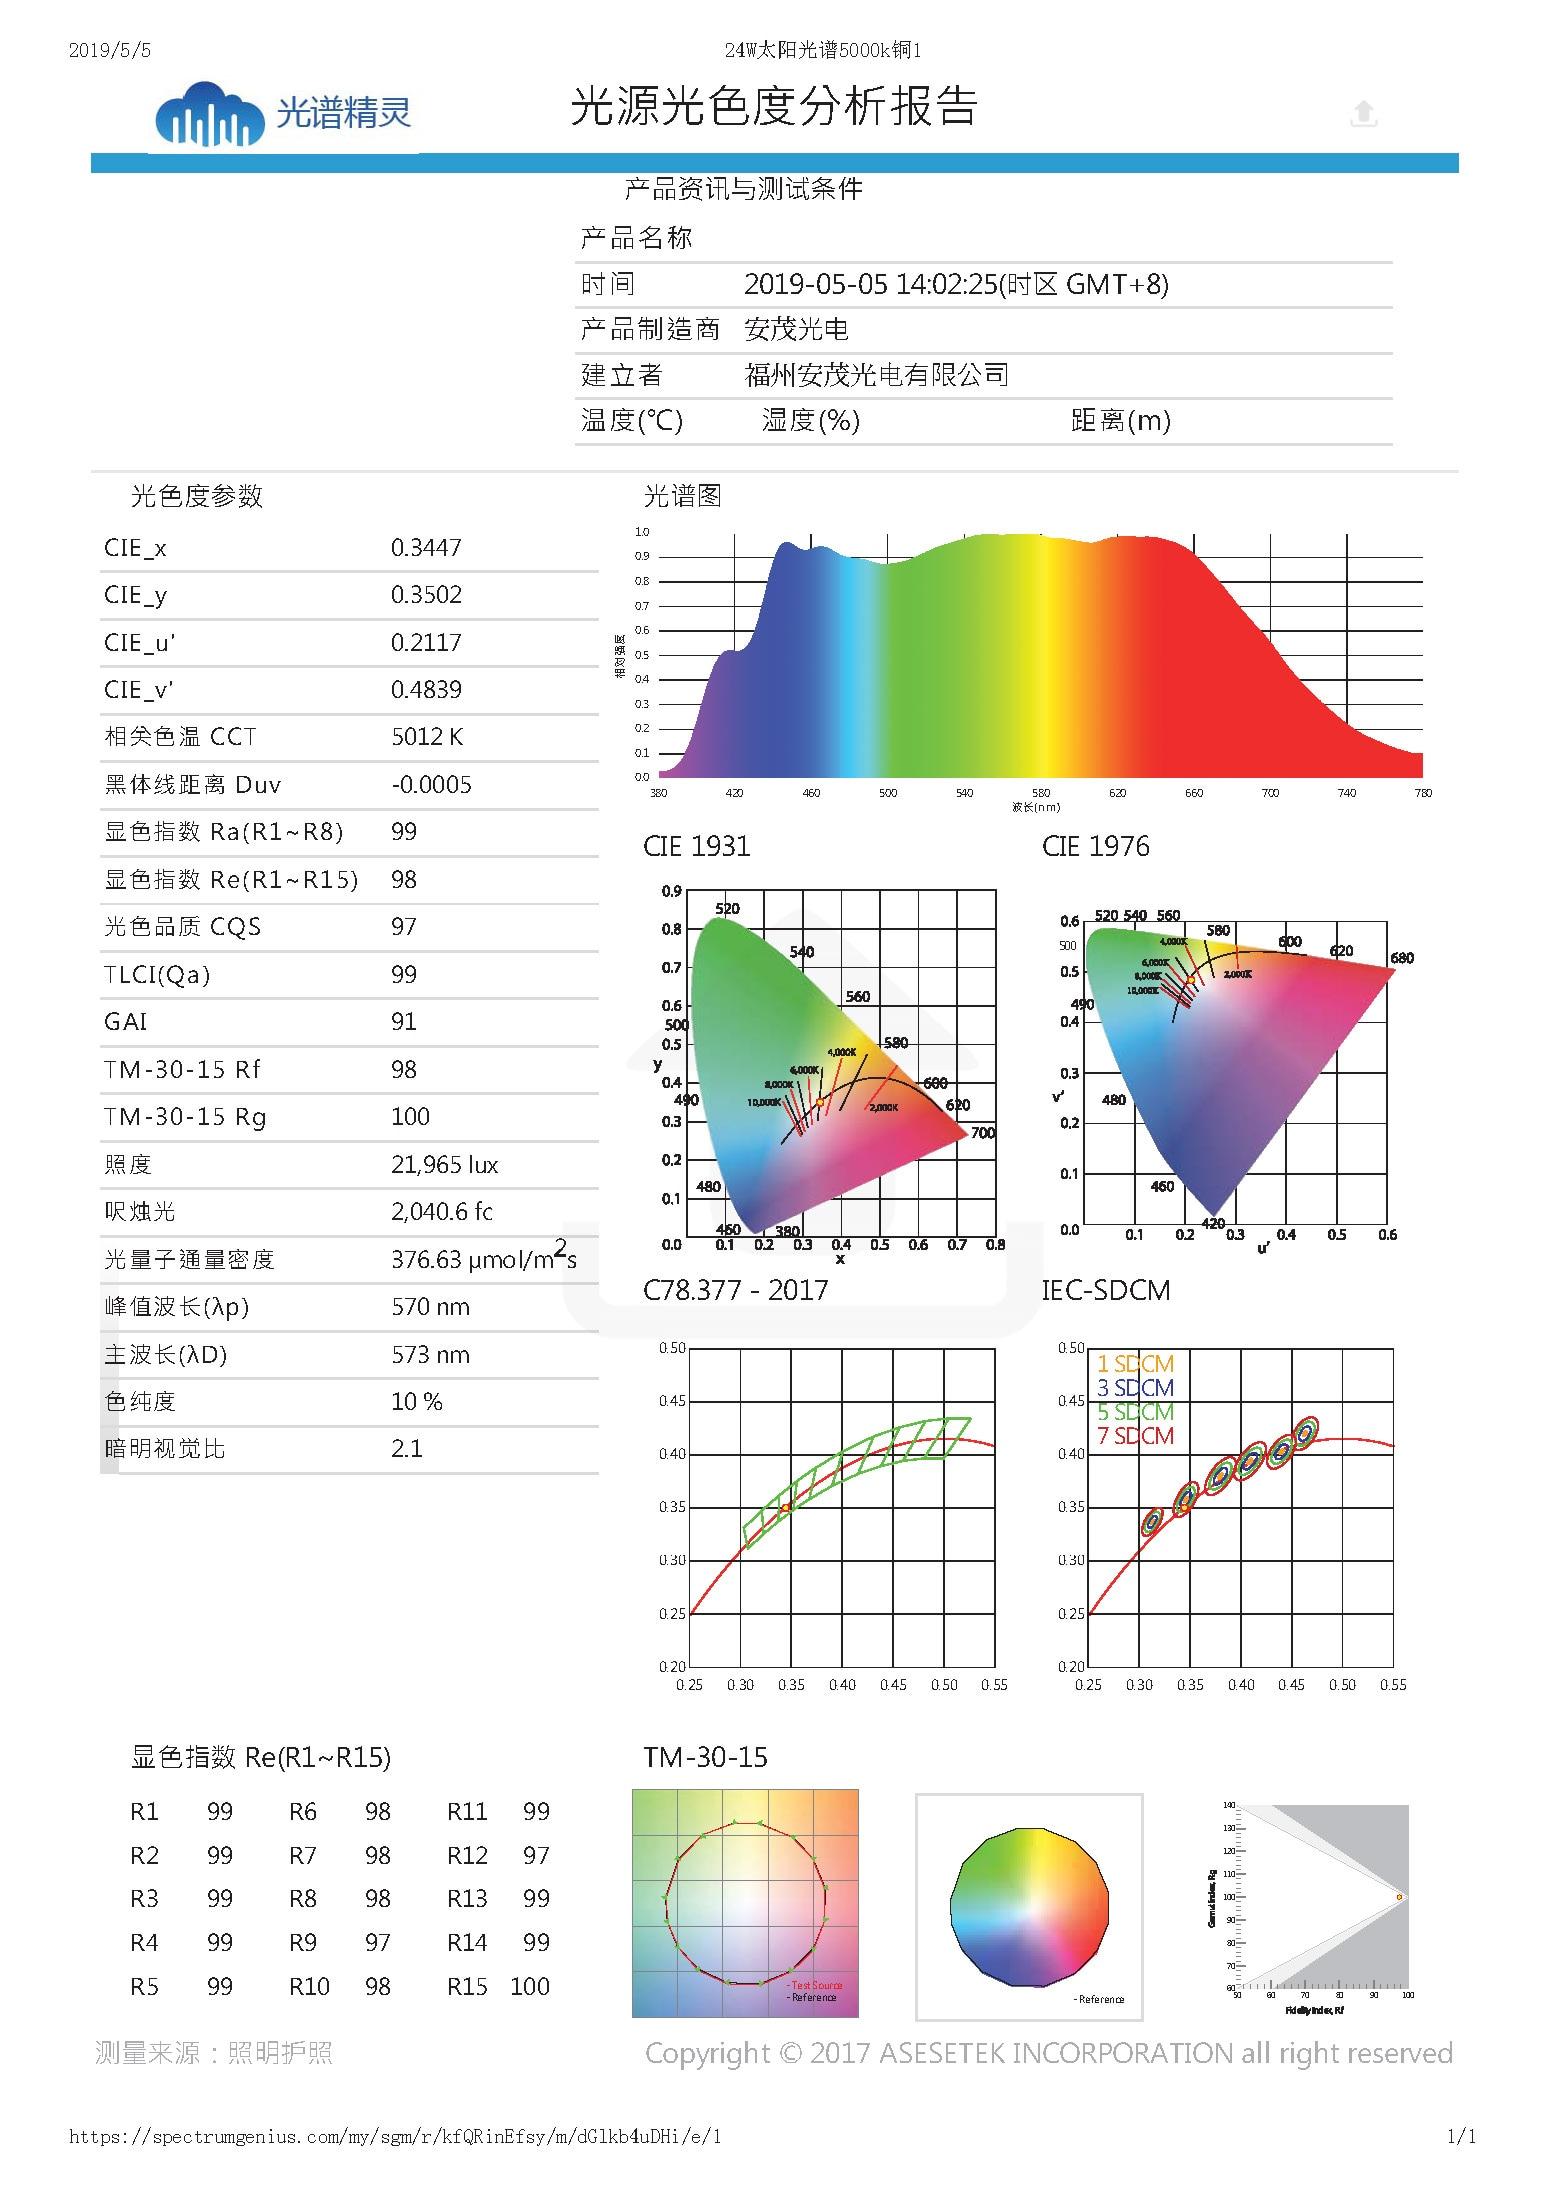 DIY LED U-Home High CRI Ra 95+ Full Spectrum 380nm-780nm LED COB LED White 5000K 50W for Plant Growing enlarge